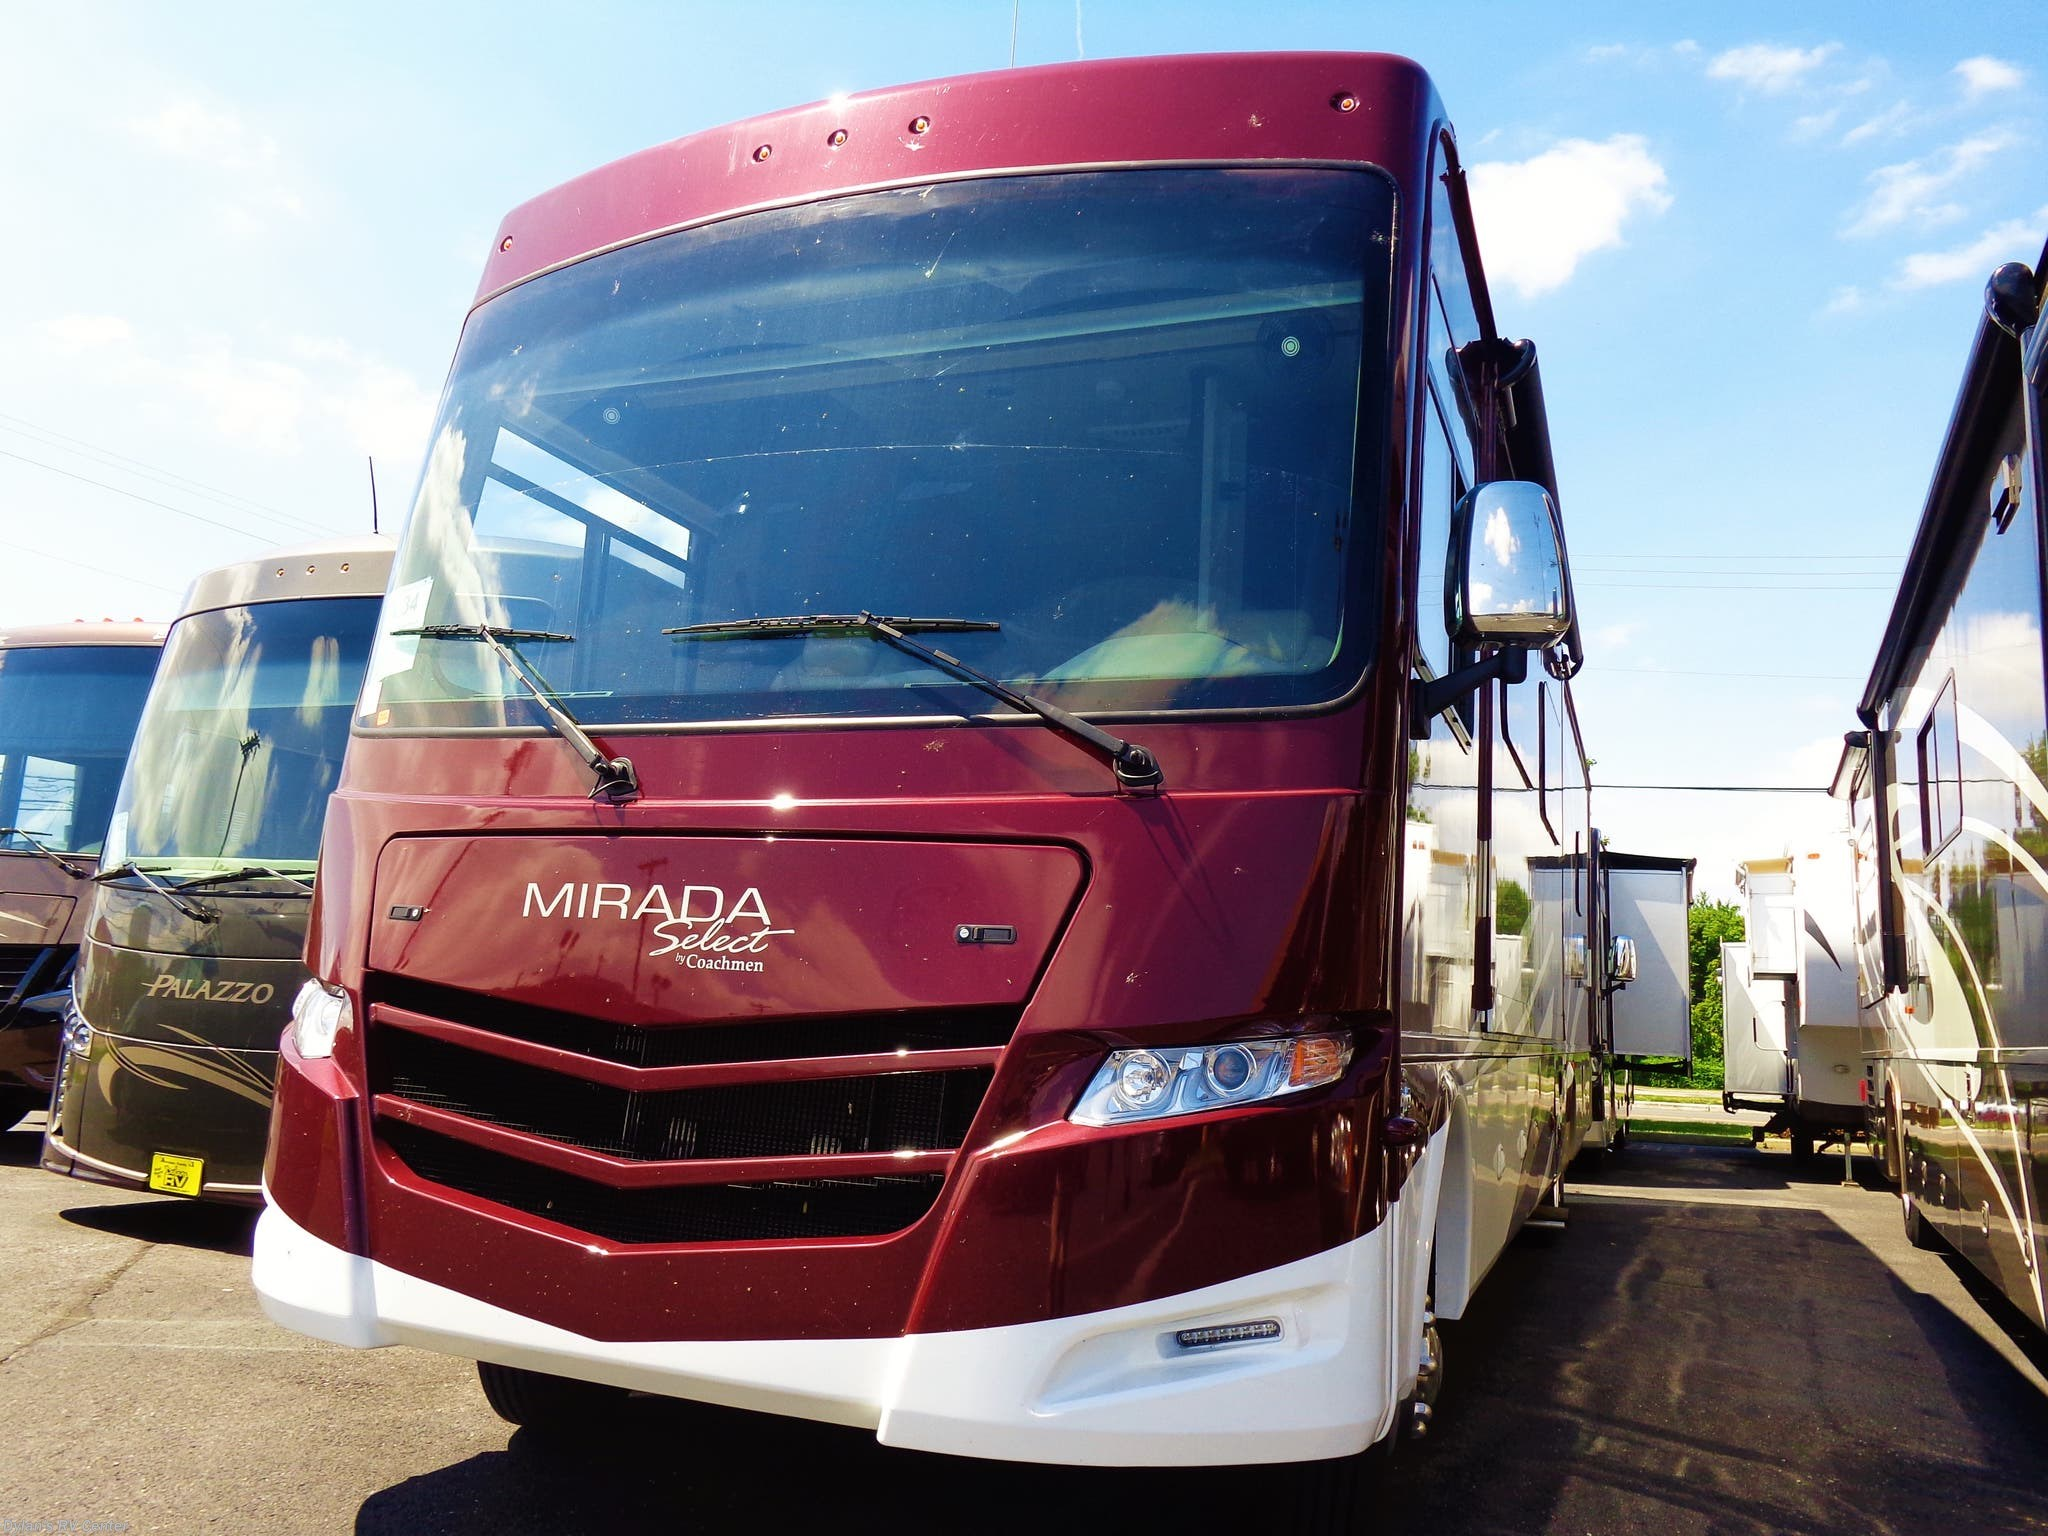 2019 Coachmen Rv Mirada Select 37tb For Sale In Sewell Nj 08080 Wiring Diagram Previous